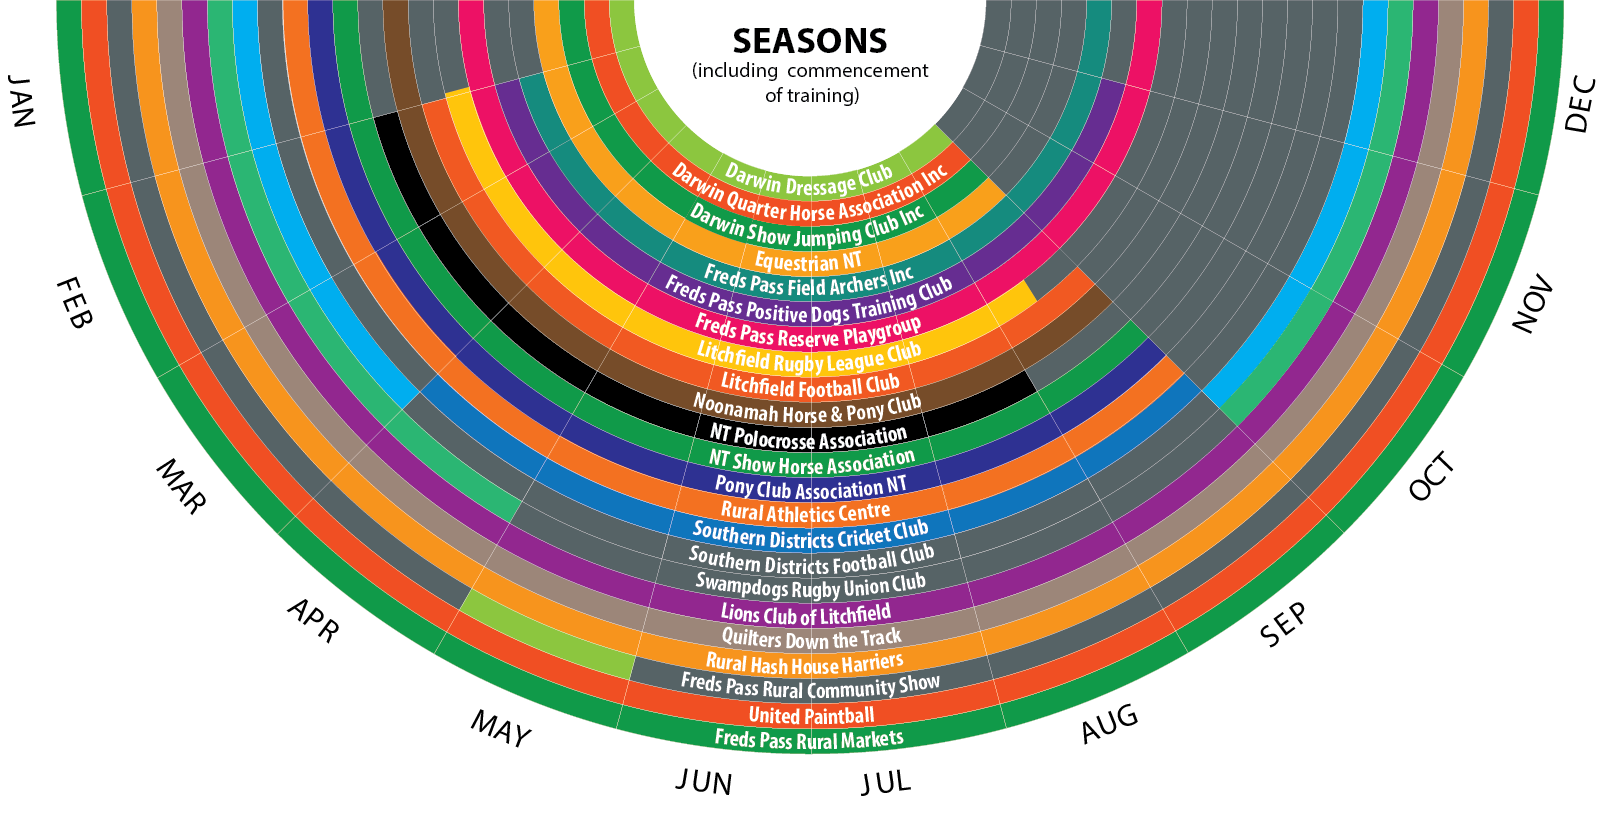 Seasons map